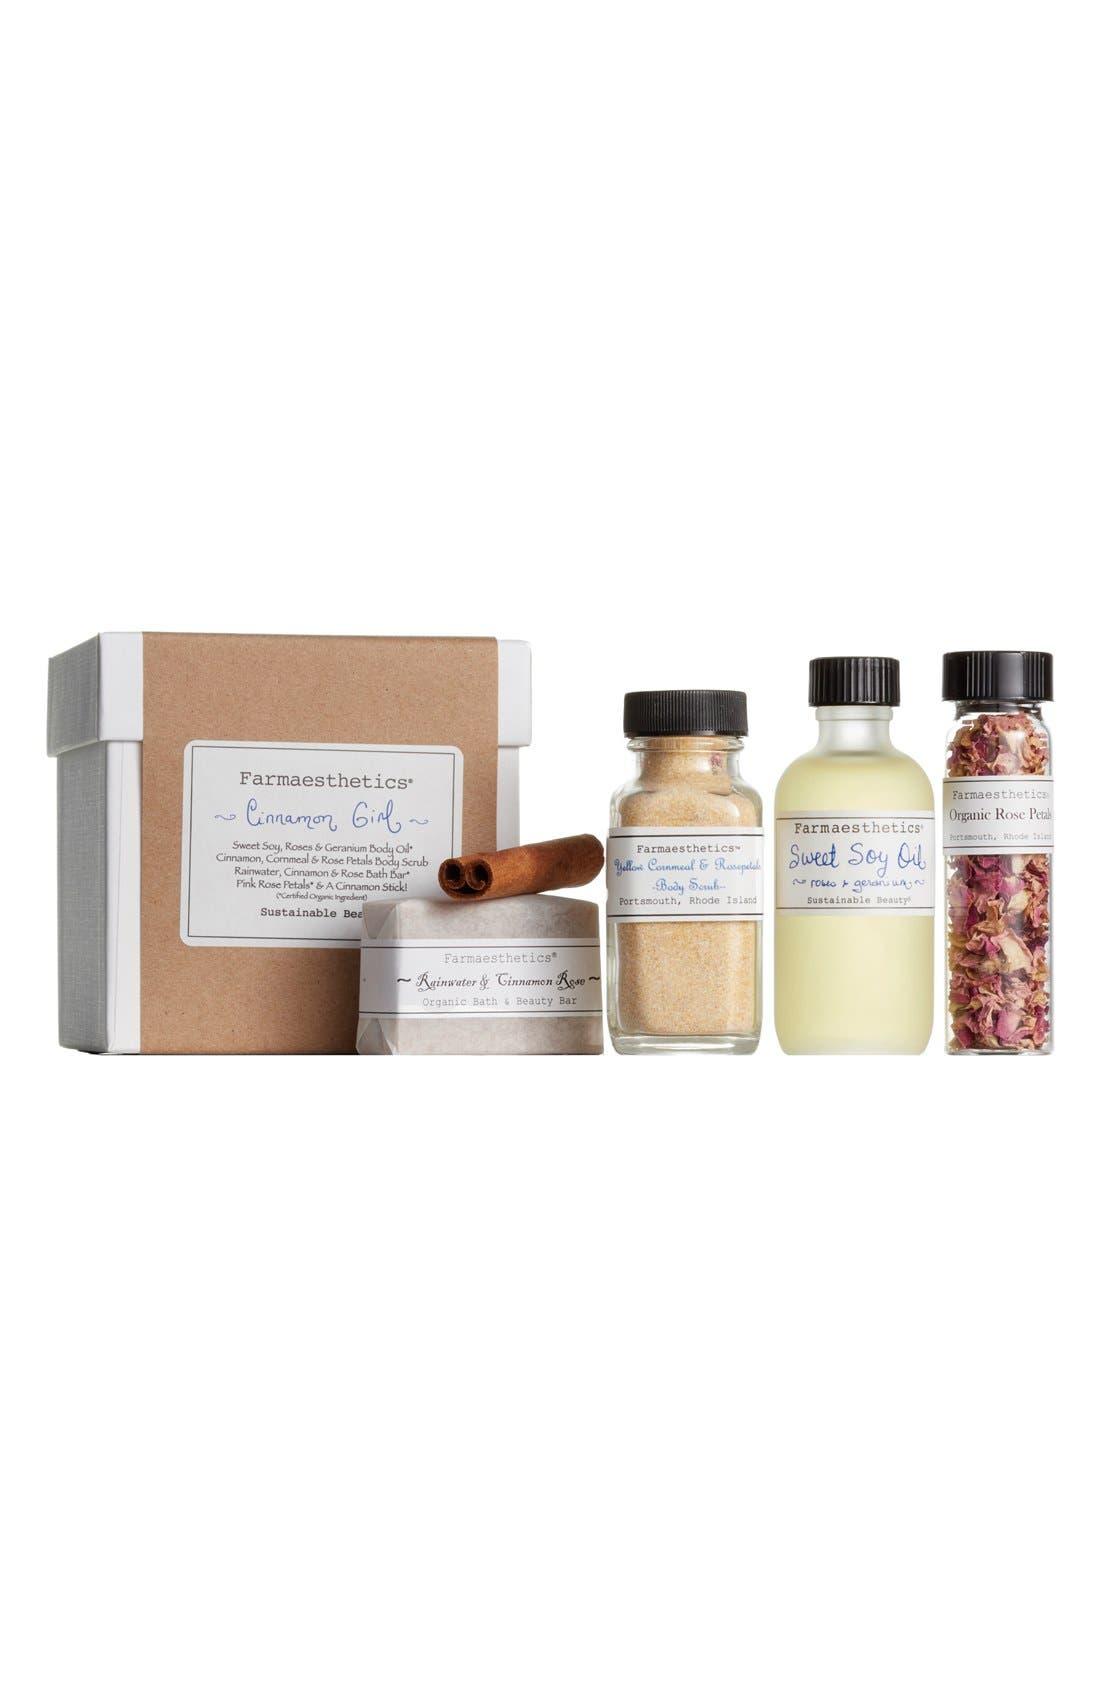 Farmaesthetics Cinnamon Girl Bath & Body Set